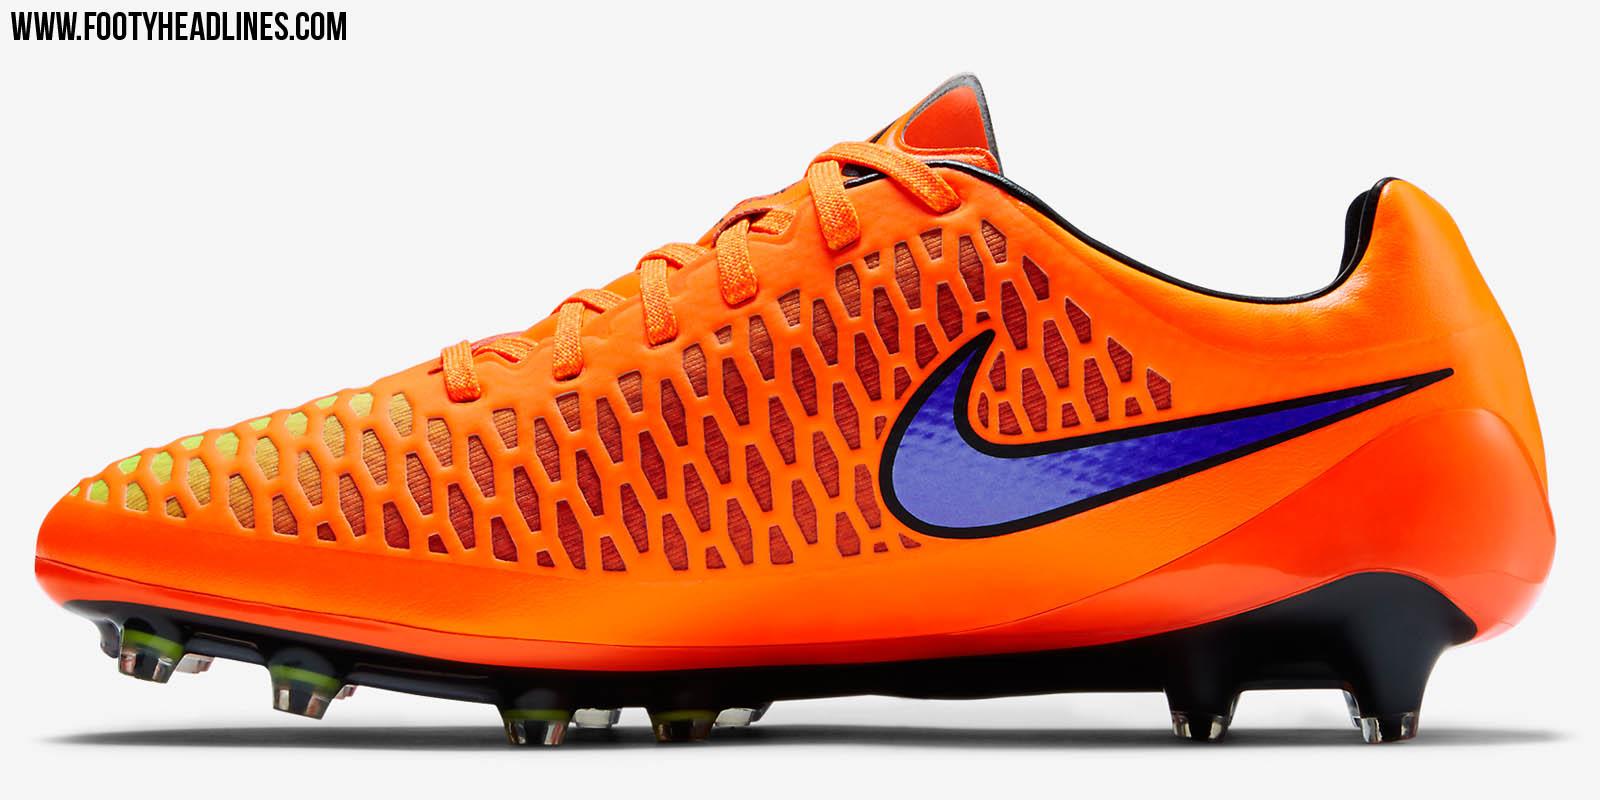 Orange Nike Magista Opus Intense Heat Pack 2015 Boots